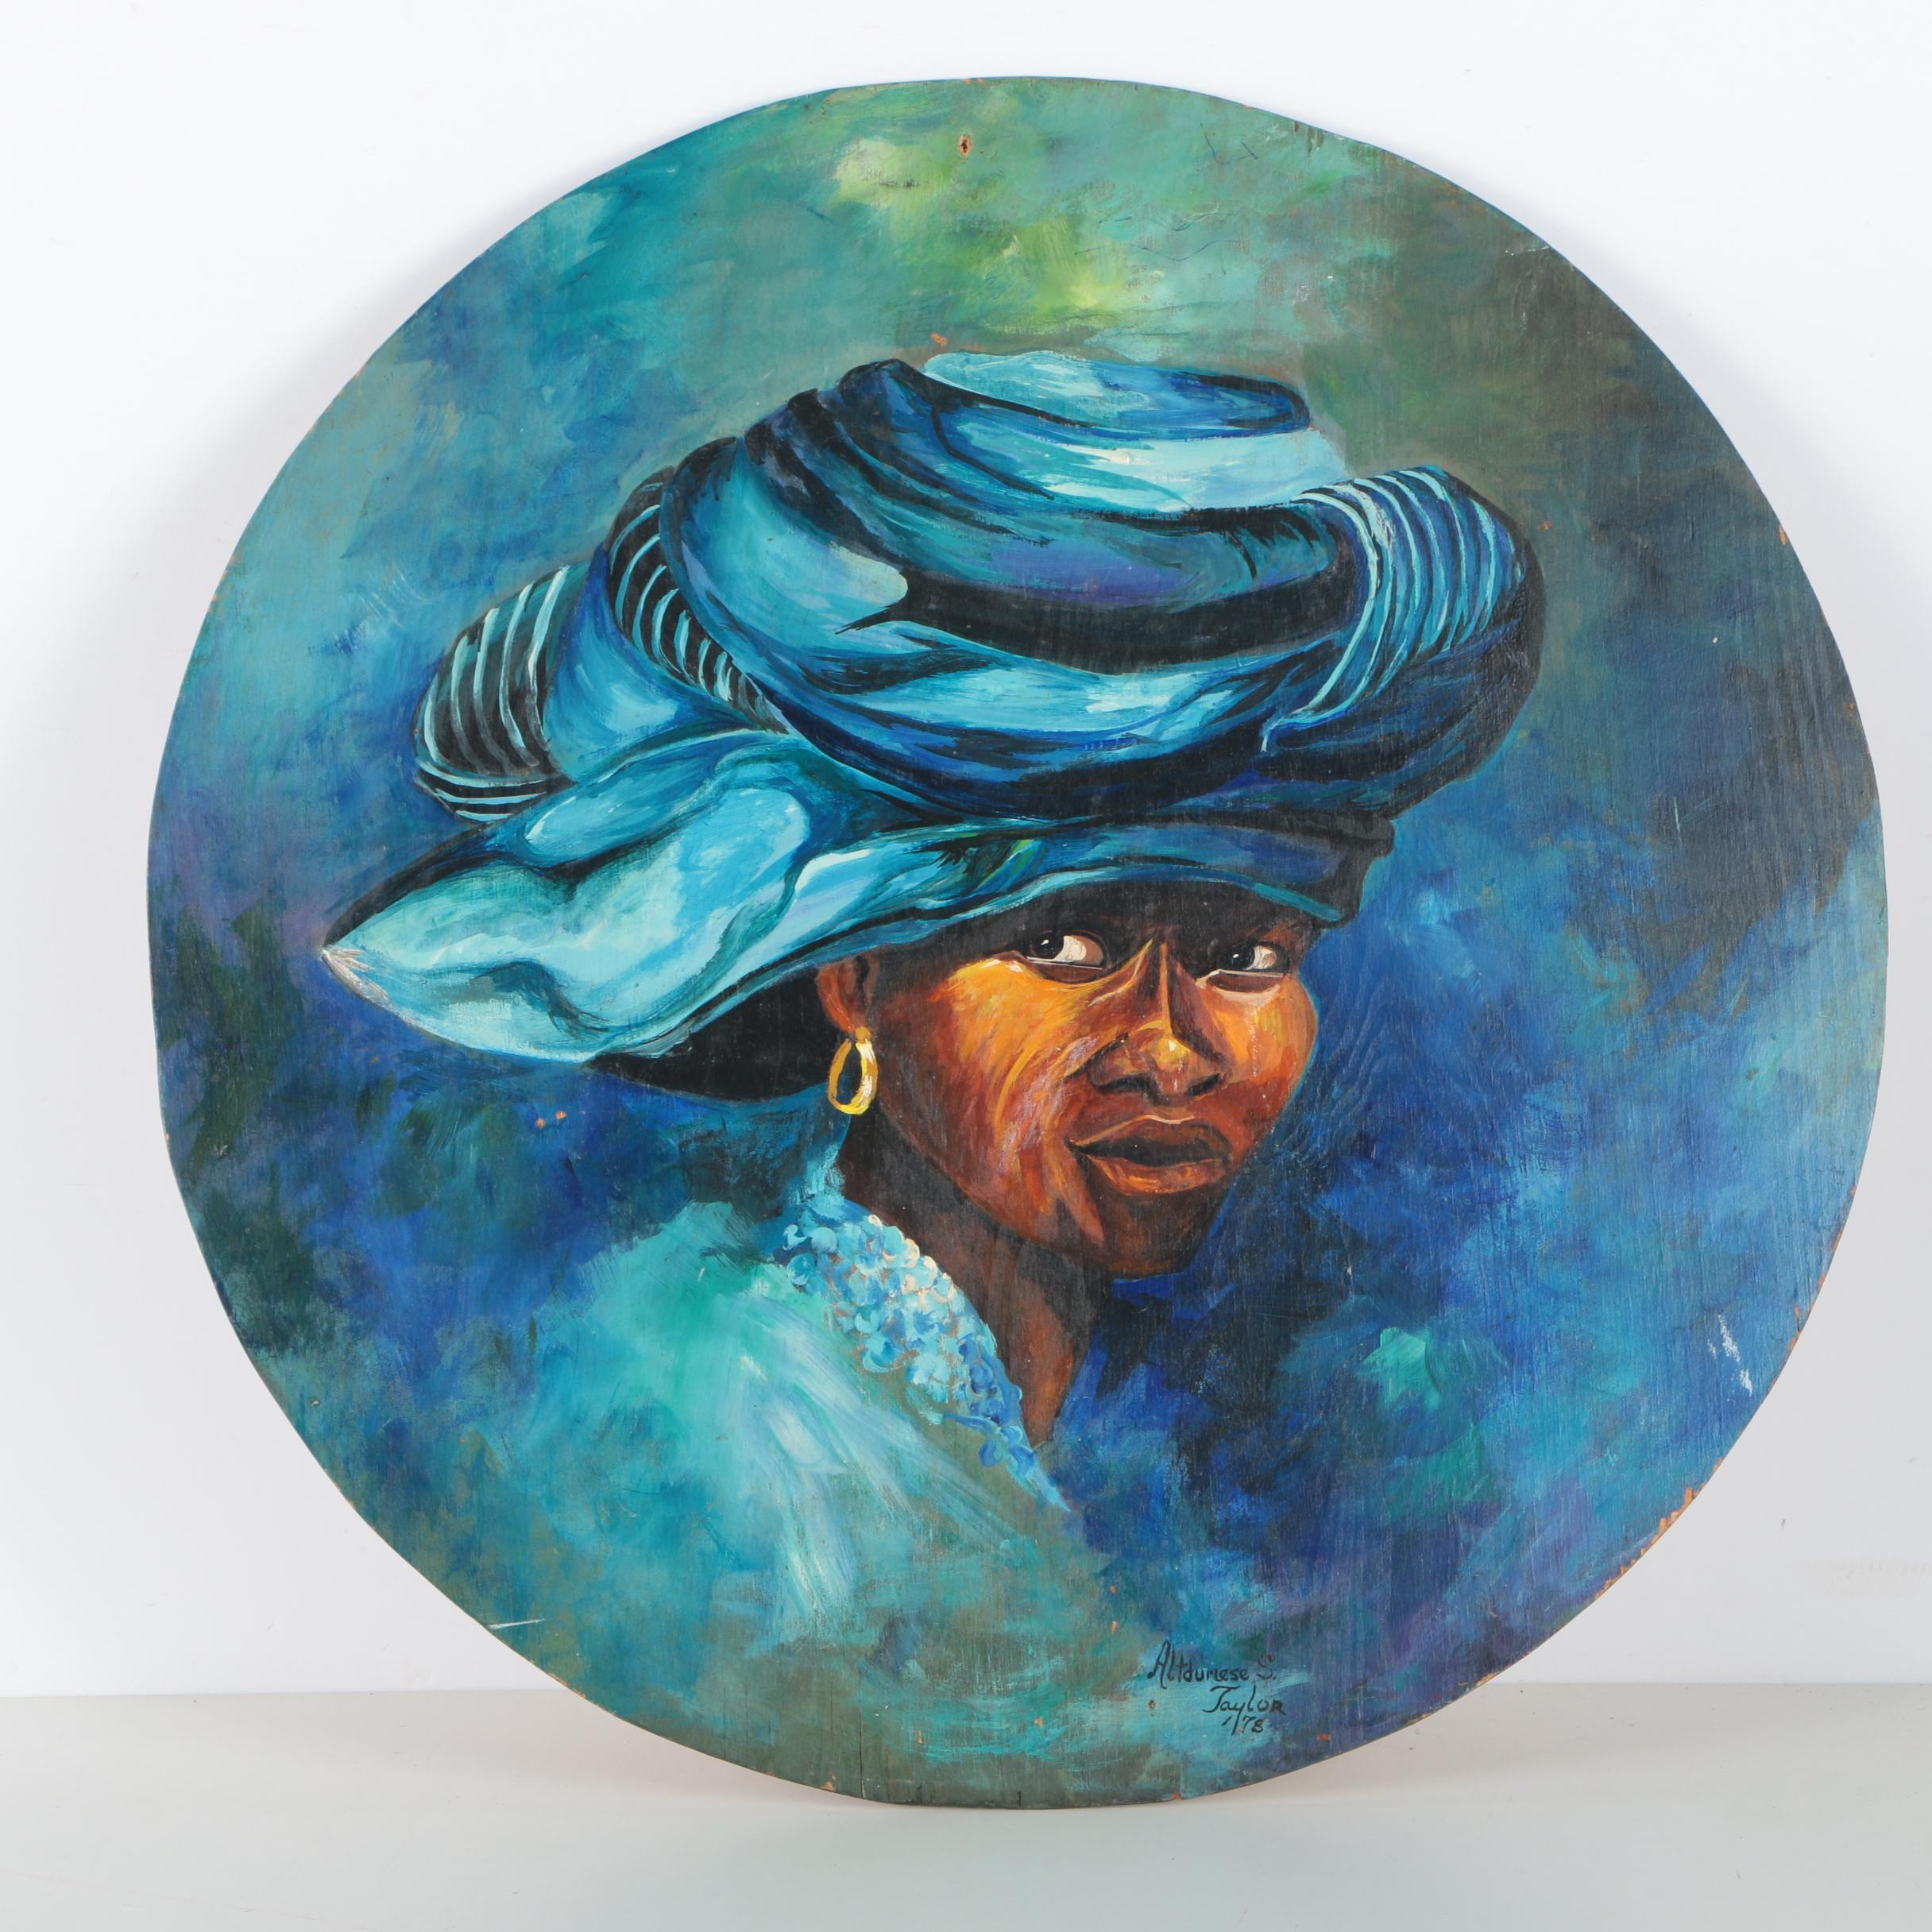 Altdumese S. Taylor Oil Portrait Painting on Board